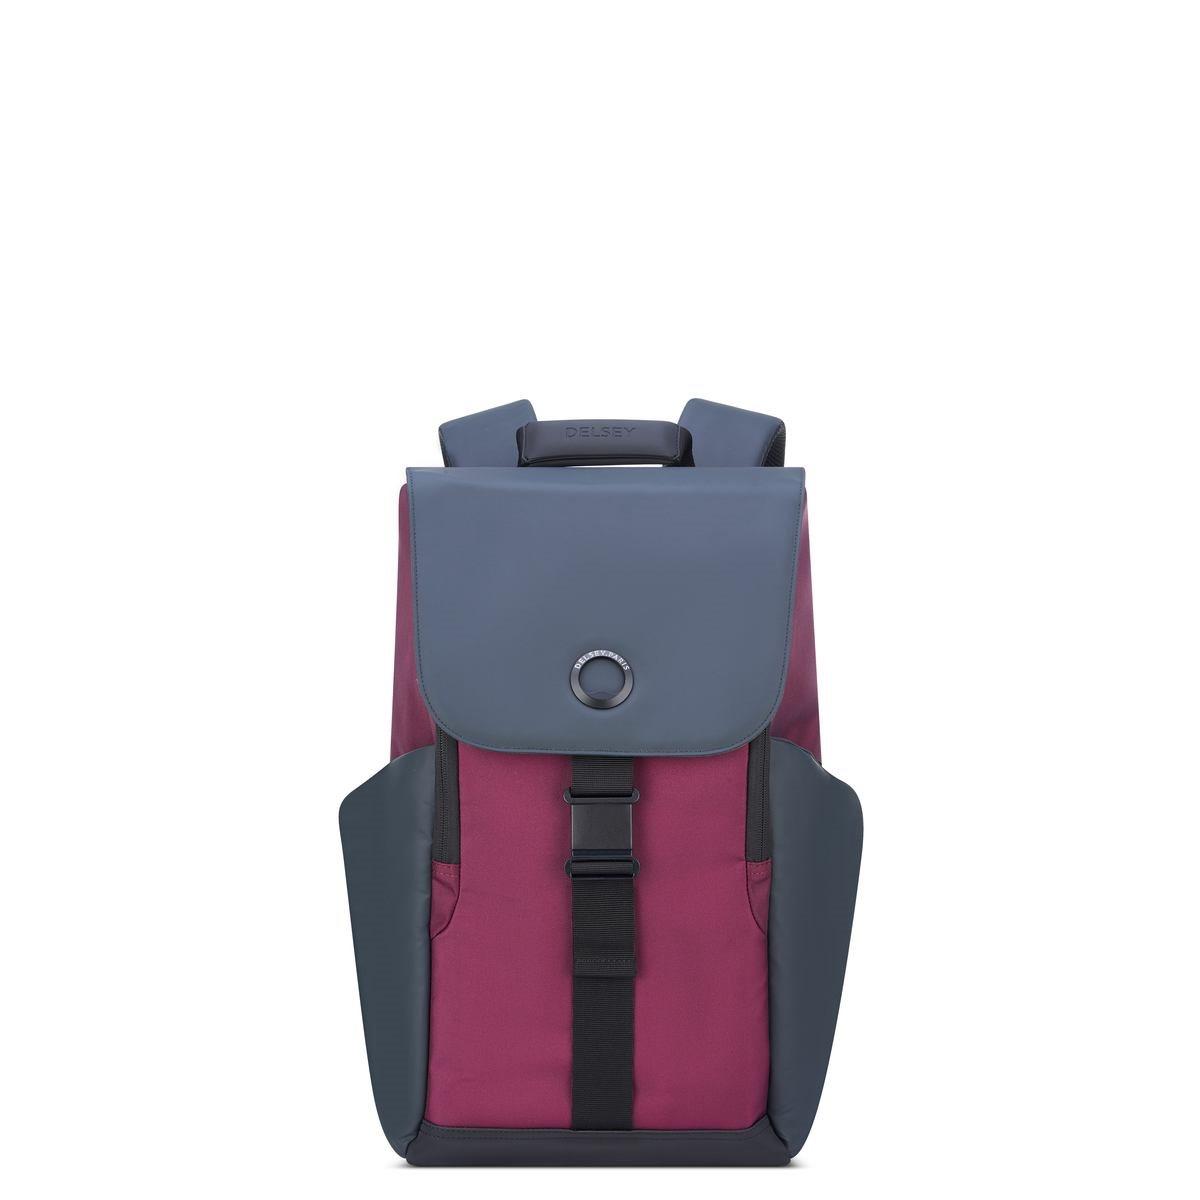 Delsey Σακίδιο πλάτης με θέση PC 15,6'' 45,5x31,5x14,5cm σειρά Securflap Burgundy